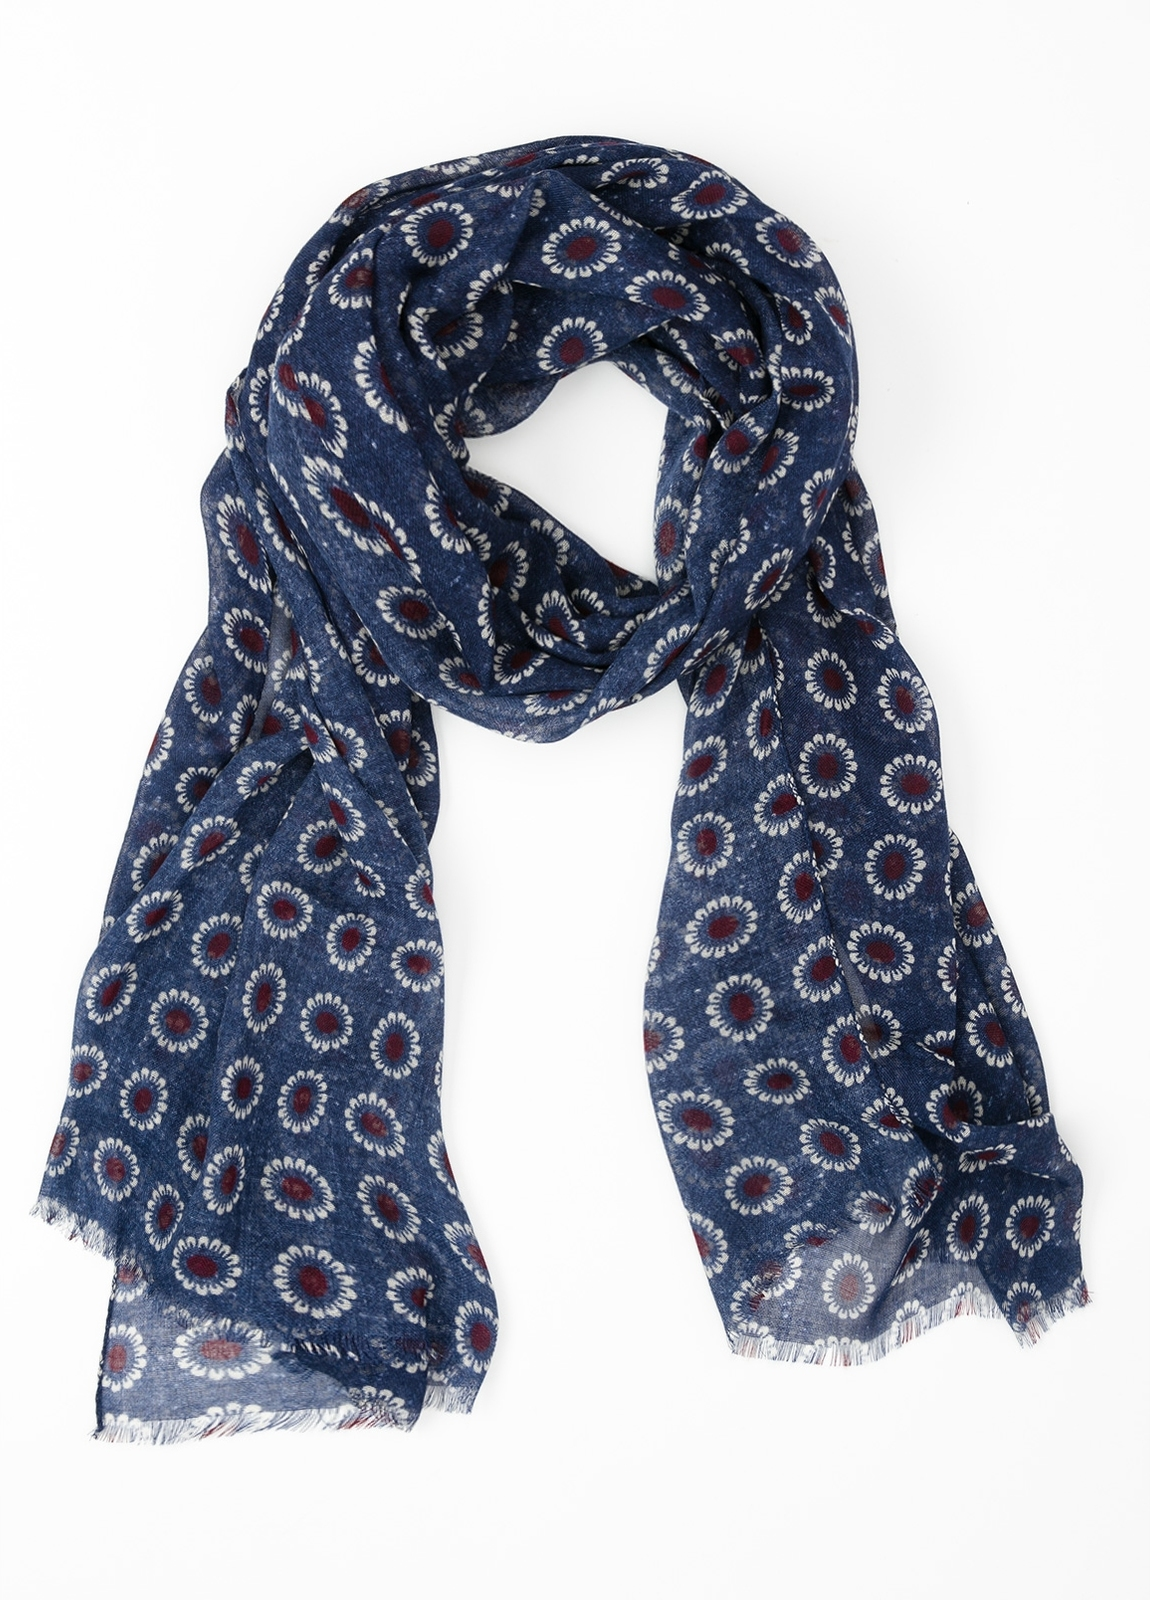 Foulard estampado floral color azul, 70 x 200 cm. 100% Lana.